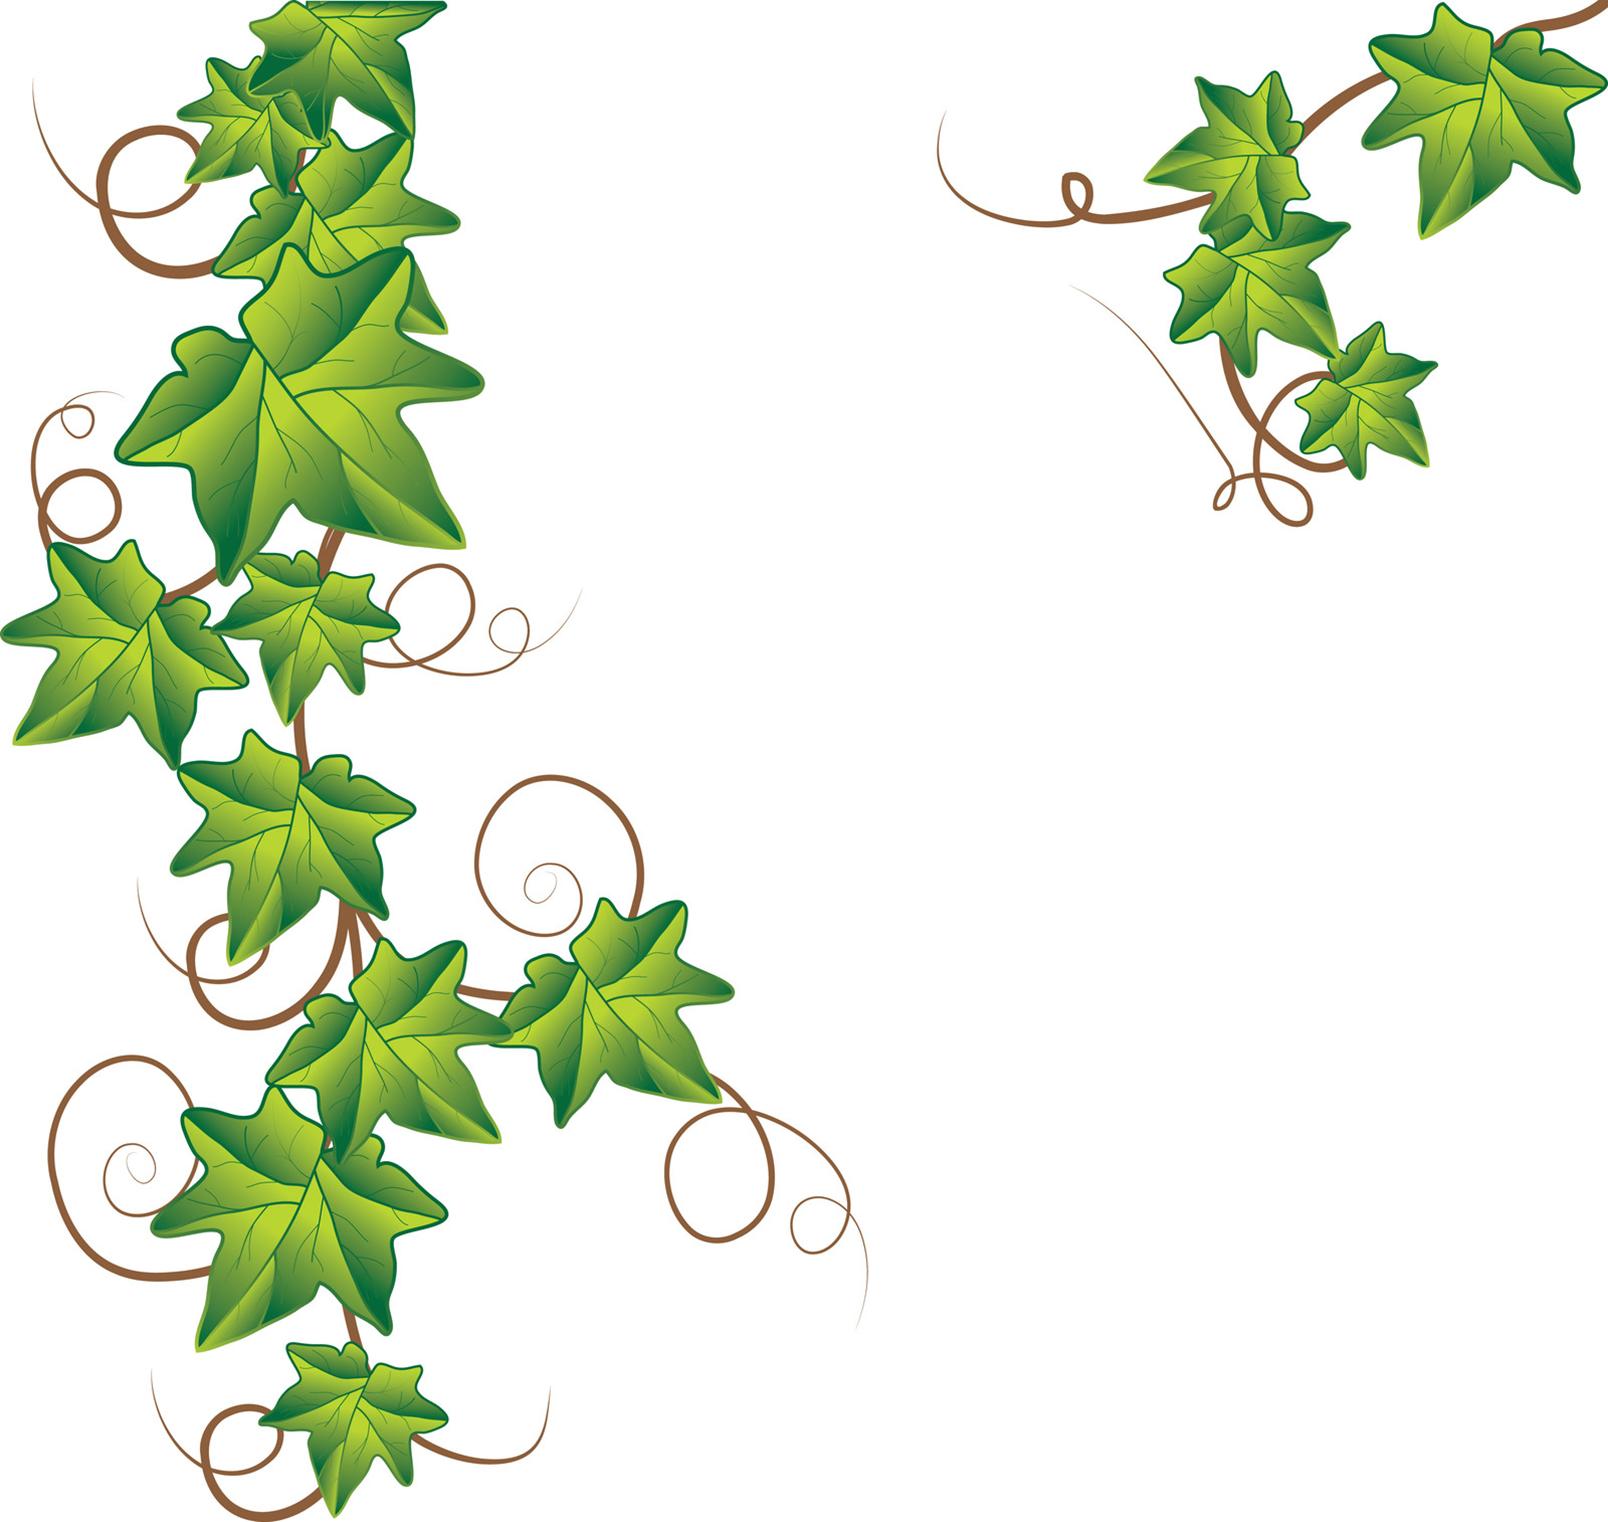 Vine Designs Art : Ivy vine tattoo designs image vector clip art